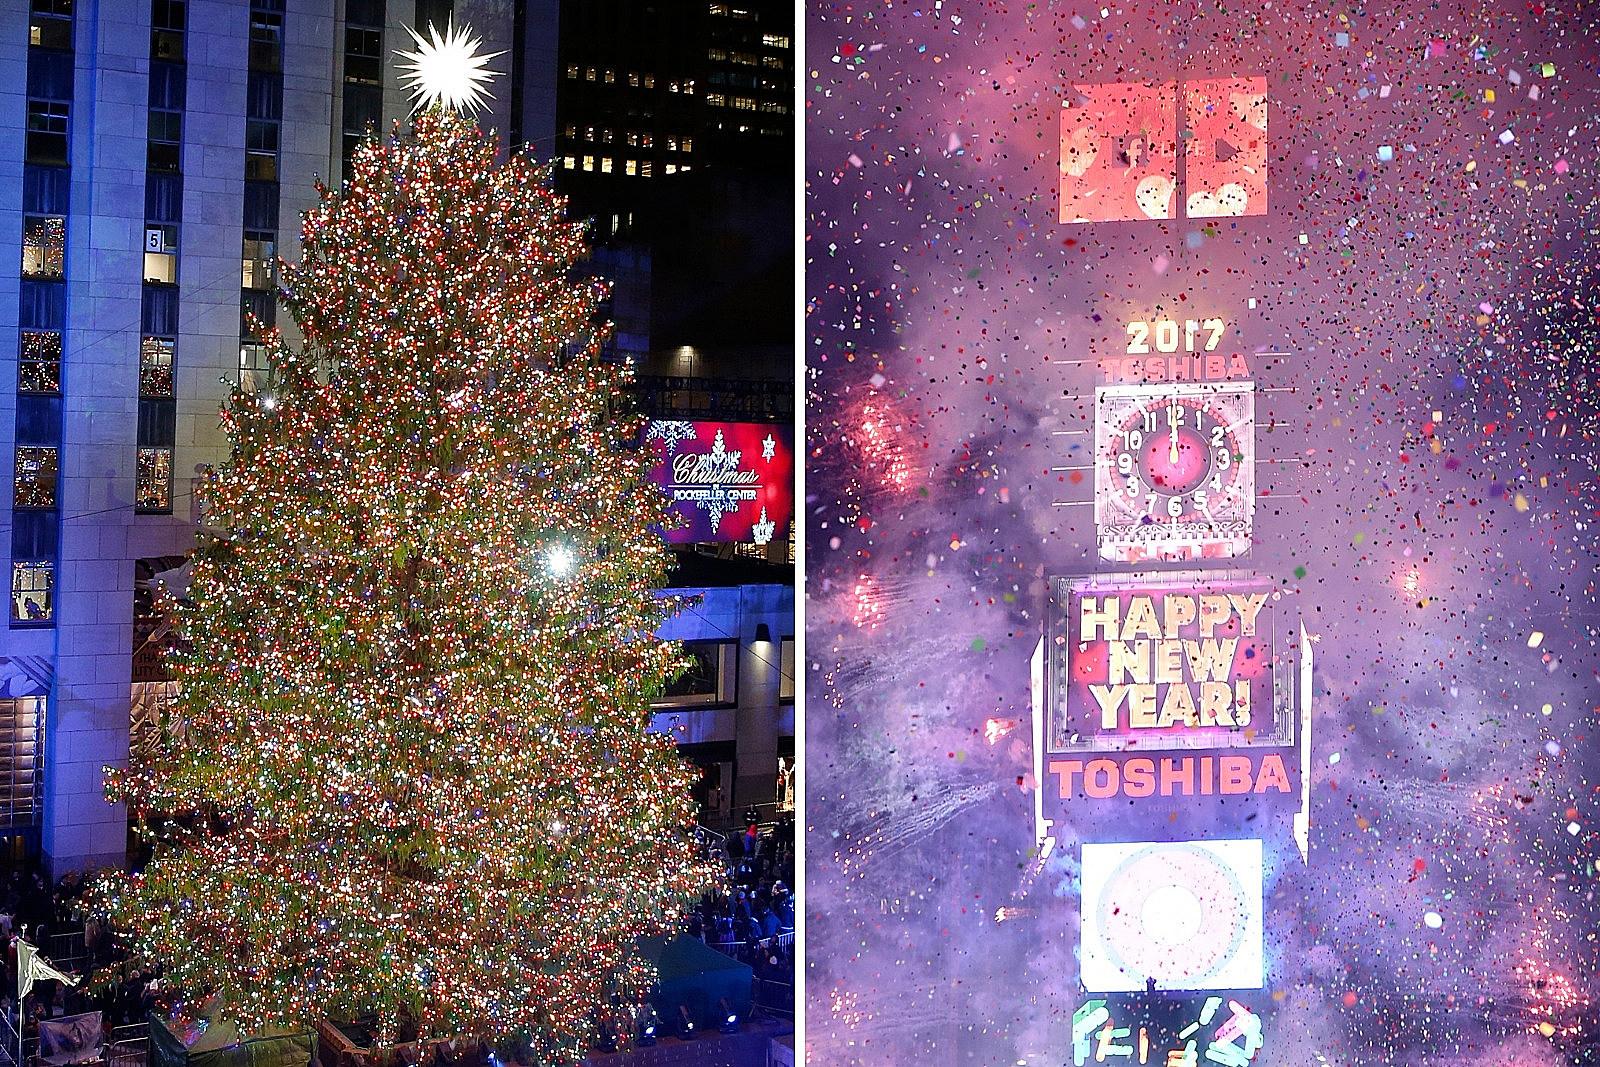 I Ran Marathoms Christmas San Antonio 2021 Virtual Plans Unveiled For Rockefeller Center Tree Lighting New Year S Eve In Times Square